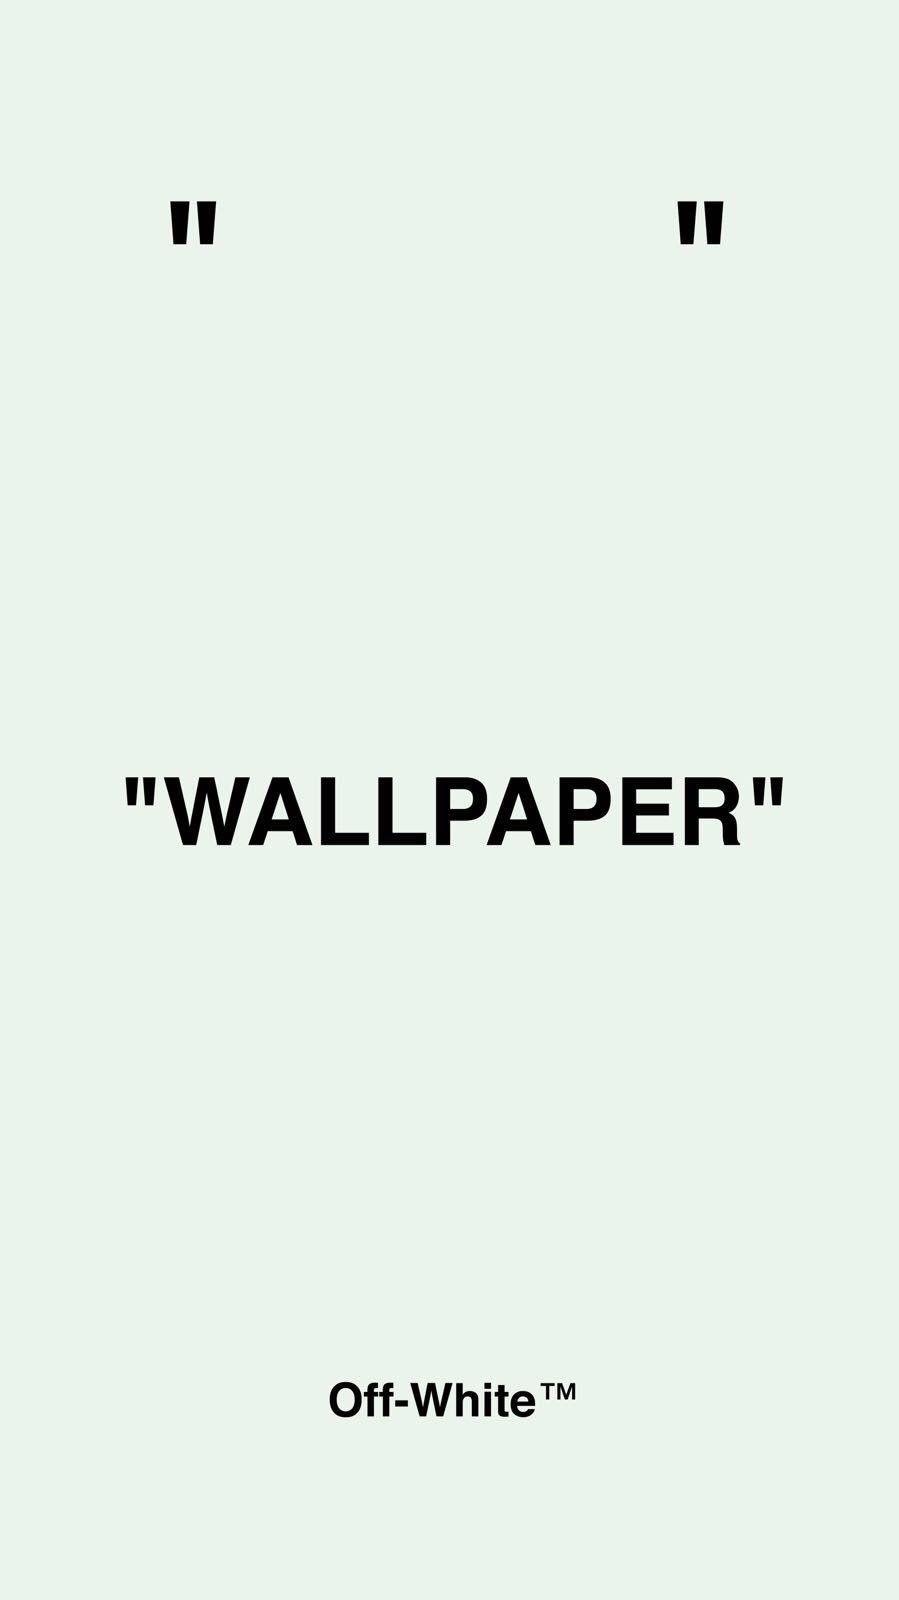 Off White Wallpaper Iphone White Wallpaper For Iphone Iphone Wallpaper Off White White Wallpaper